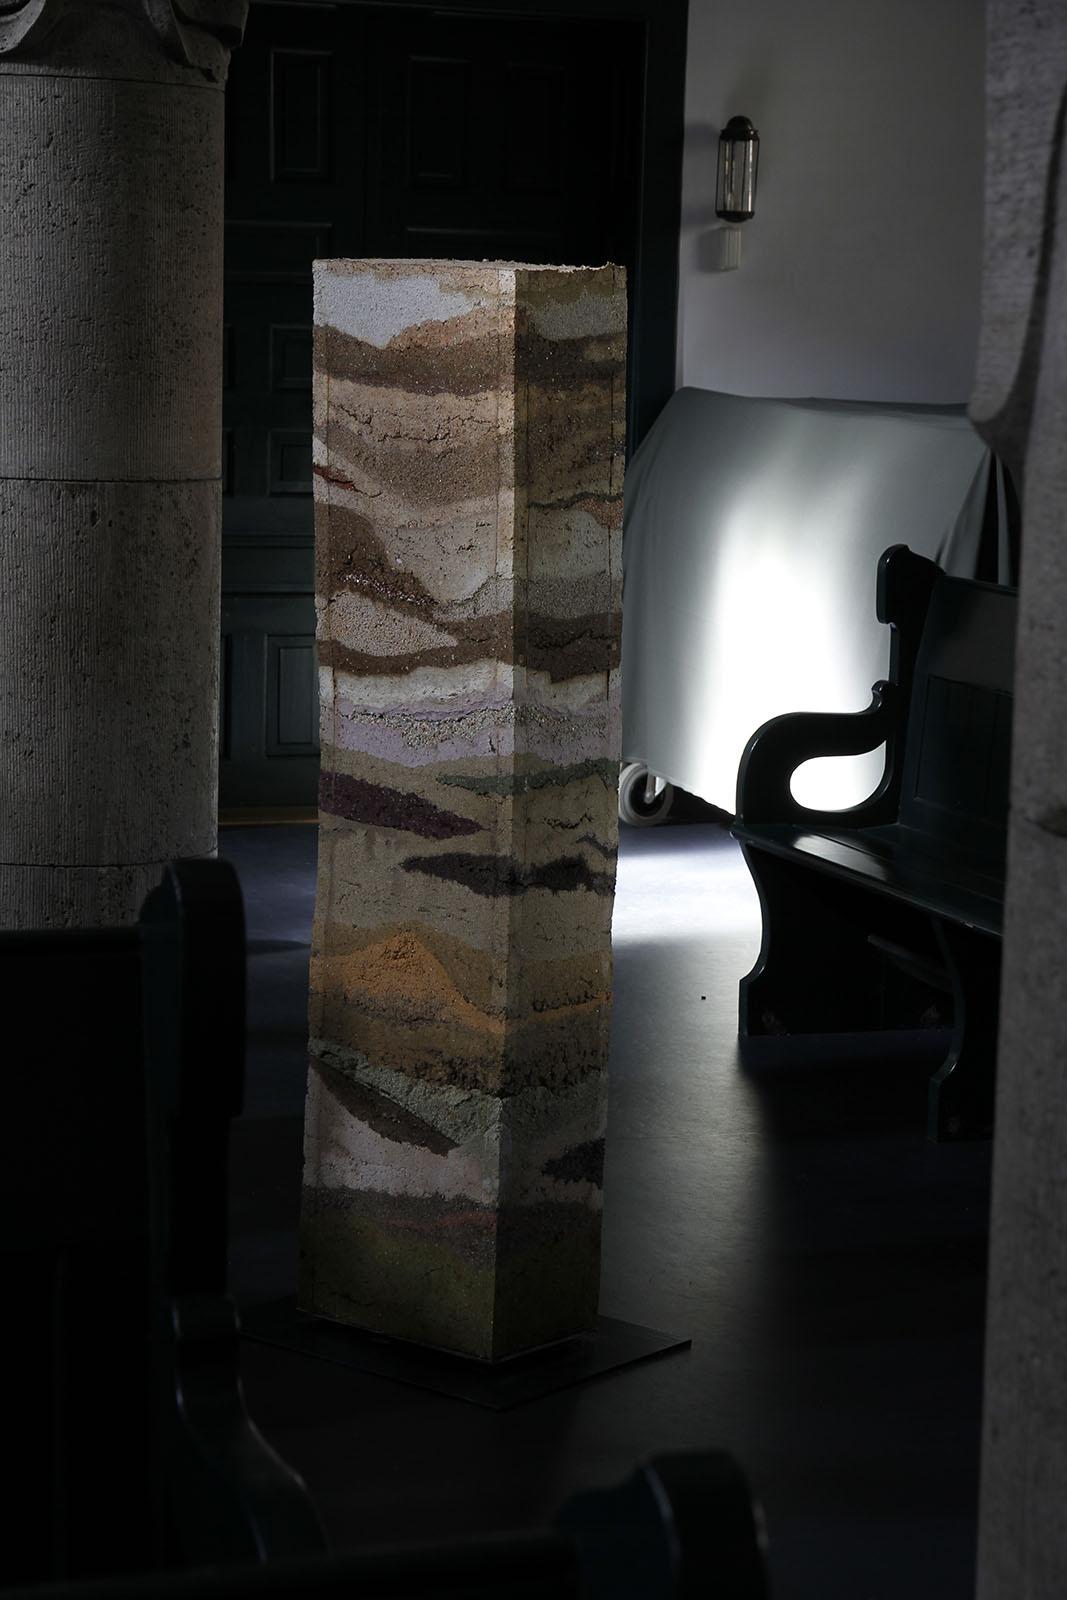 Claudia-Marr-Kunst-Komposition-IH-m